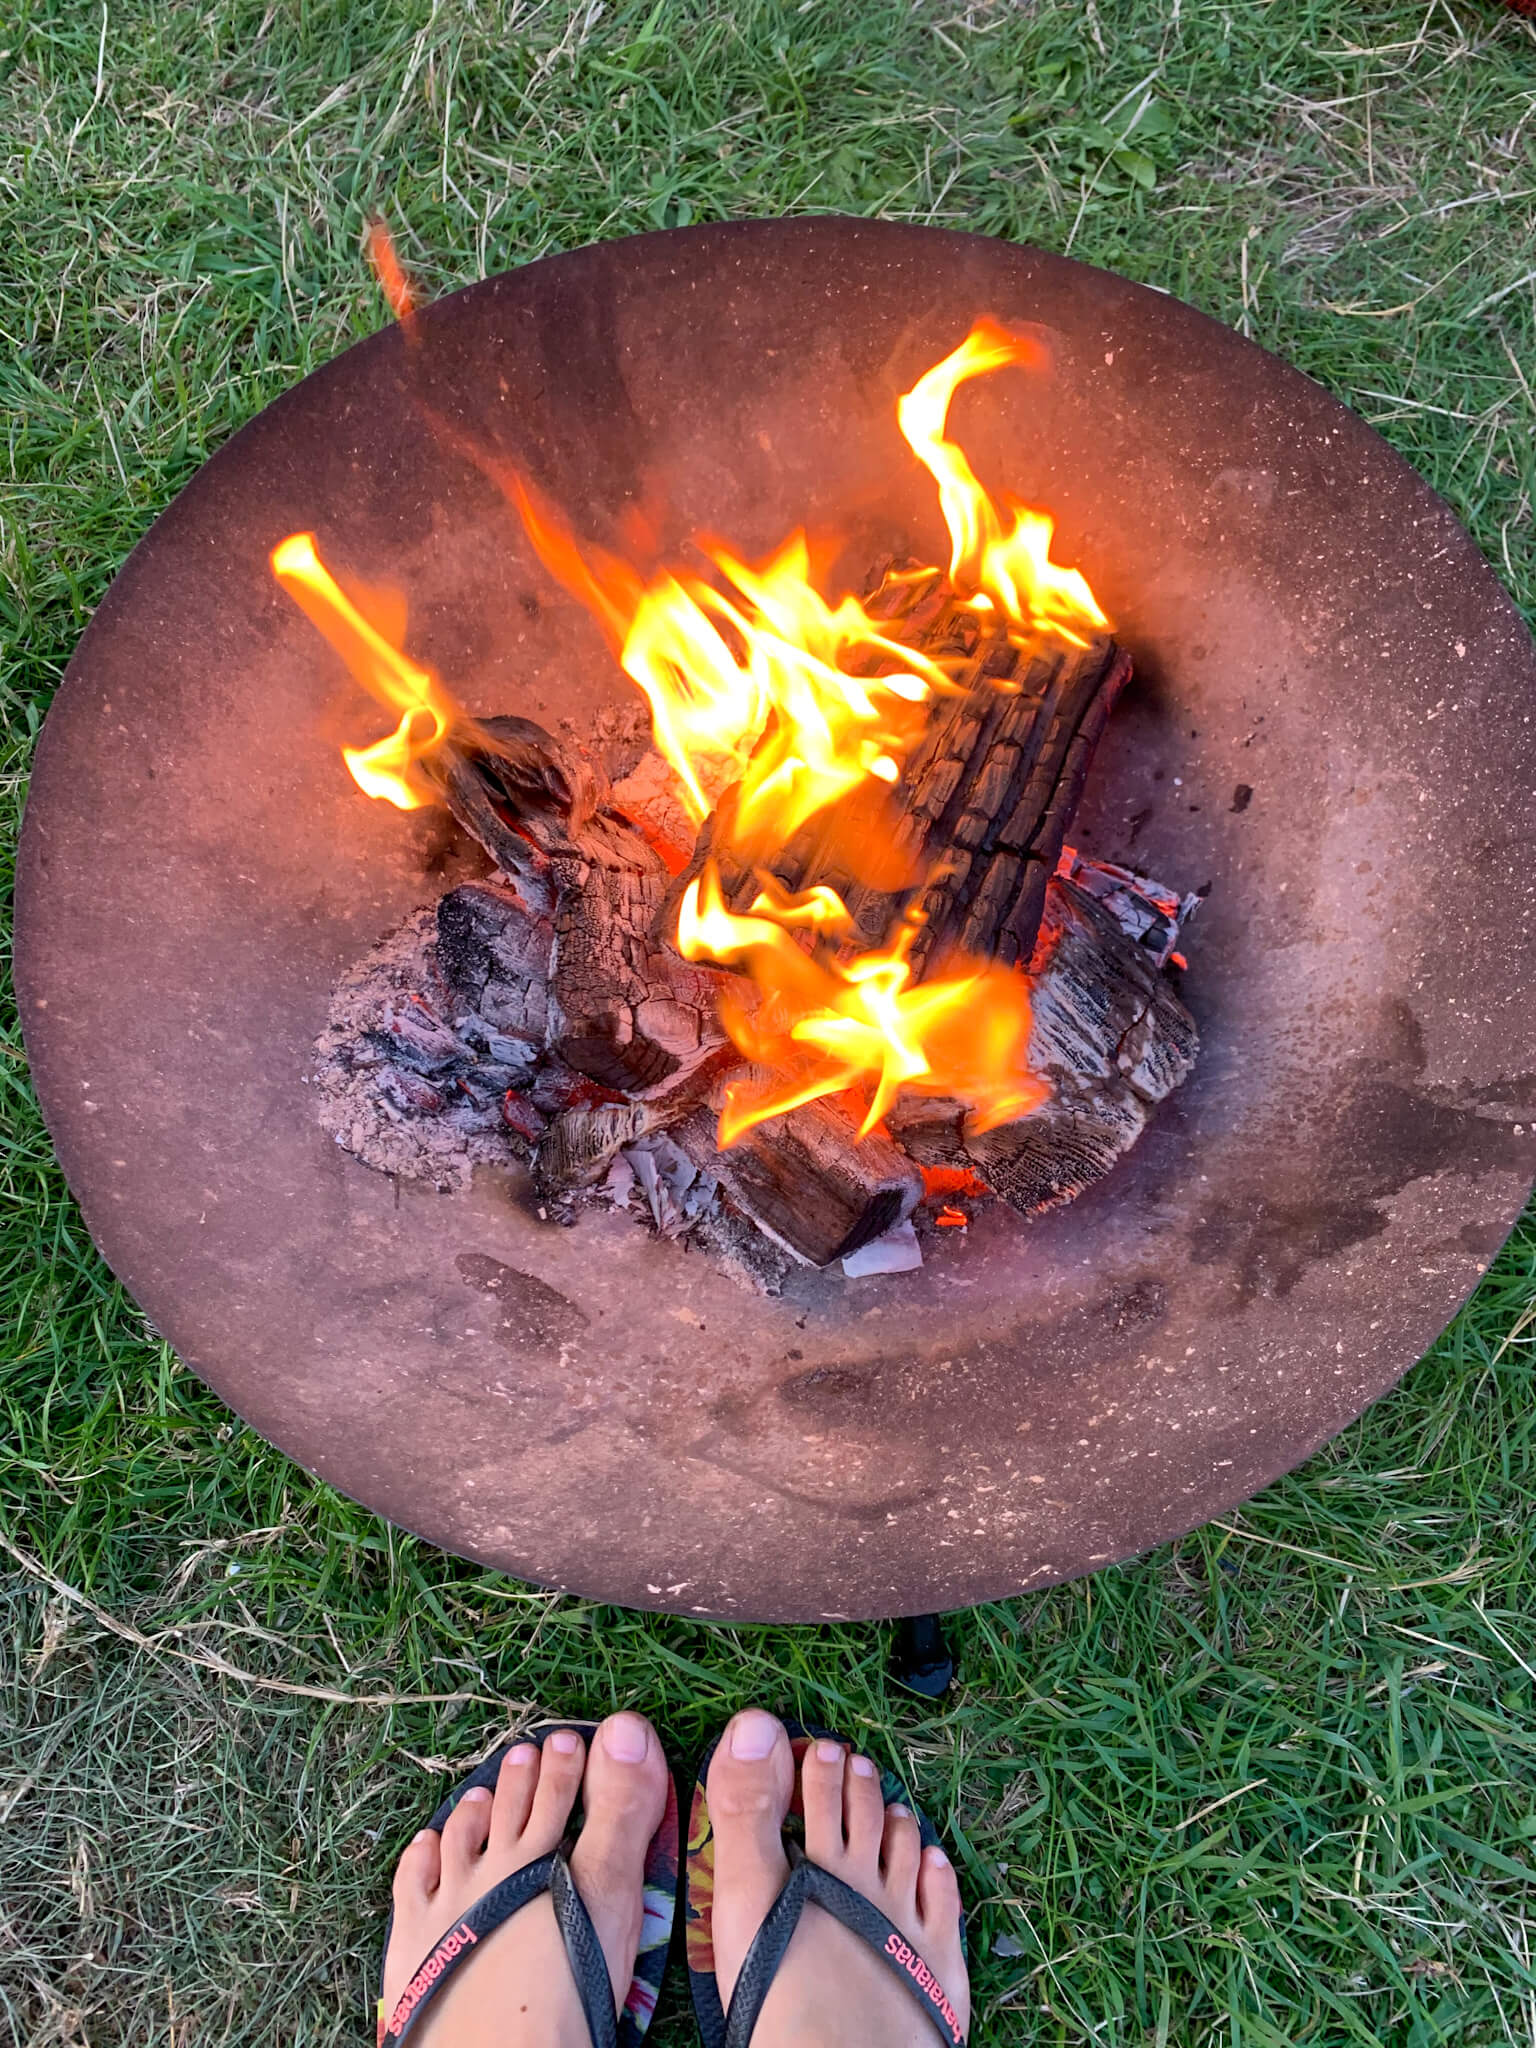 Campfire, Hurst View Campsite, Lymington